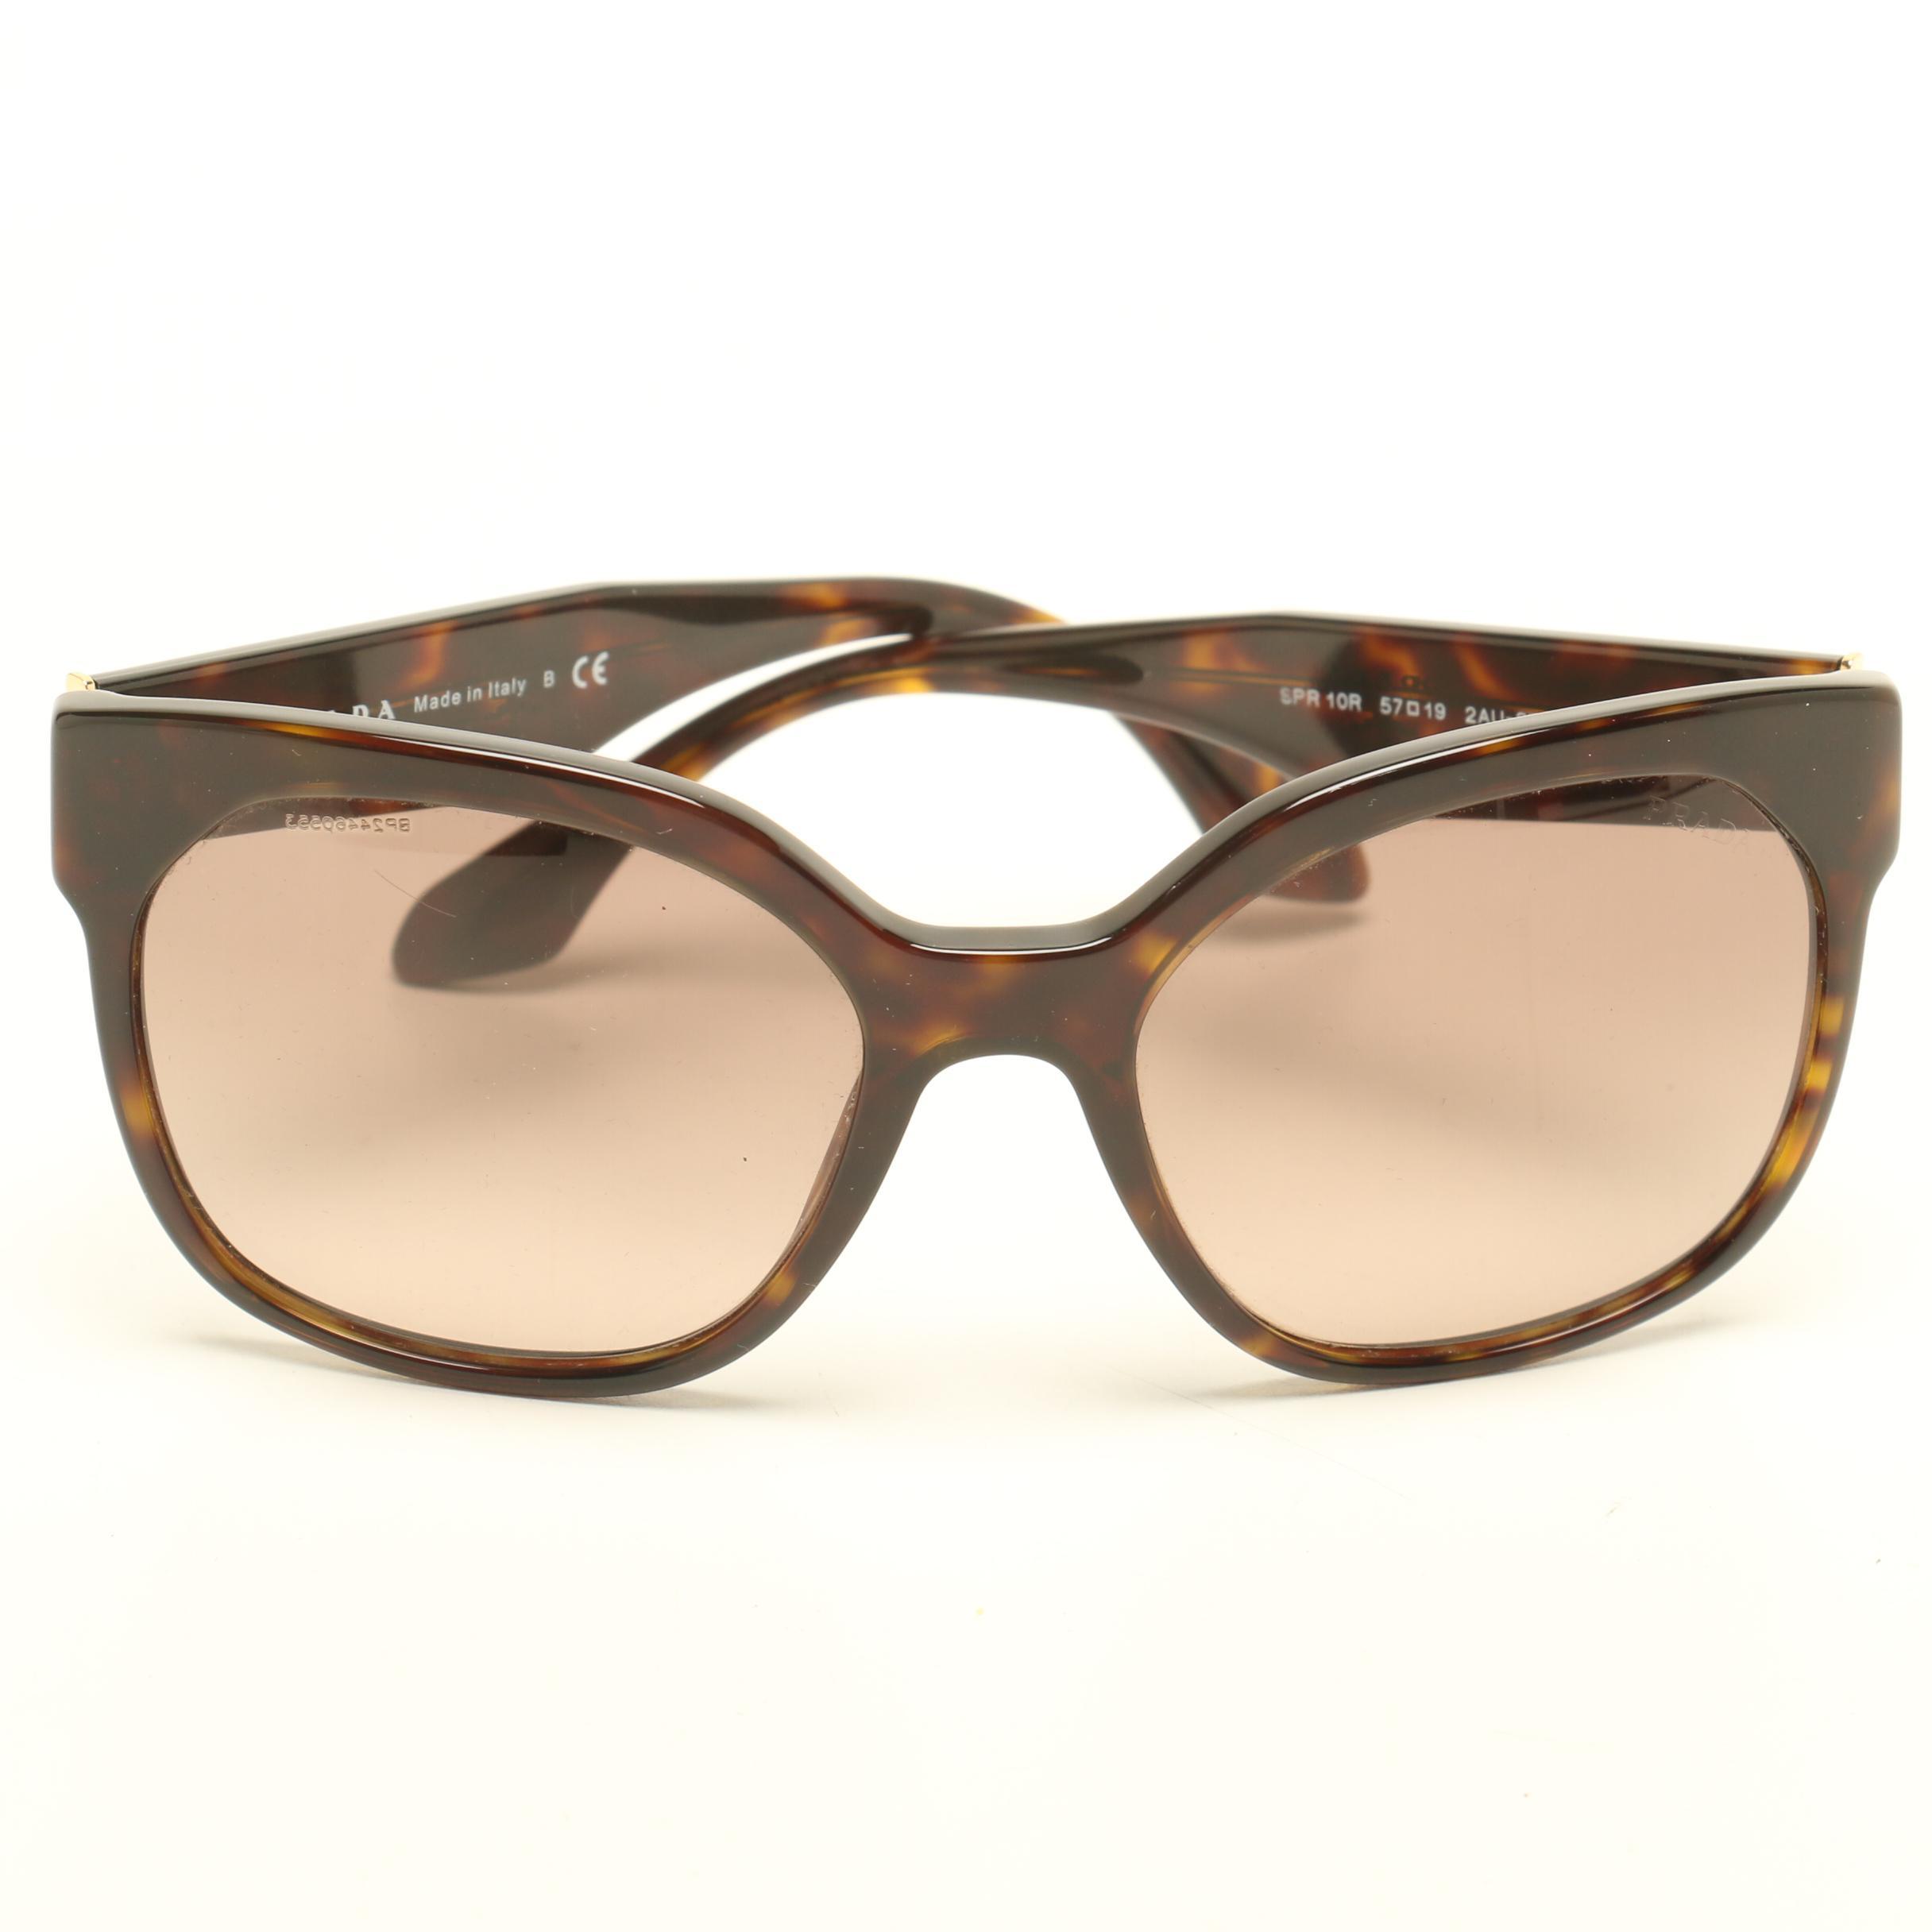 cbbe994da427 ... clearance prada tortoiseshell style modified cat eye designer sunglasses  ebth cb13c c16bf